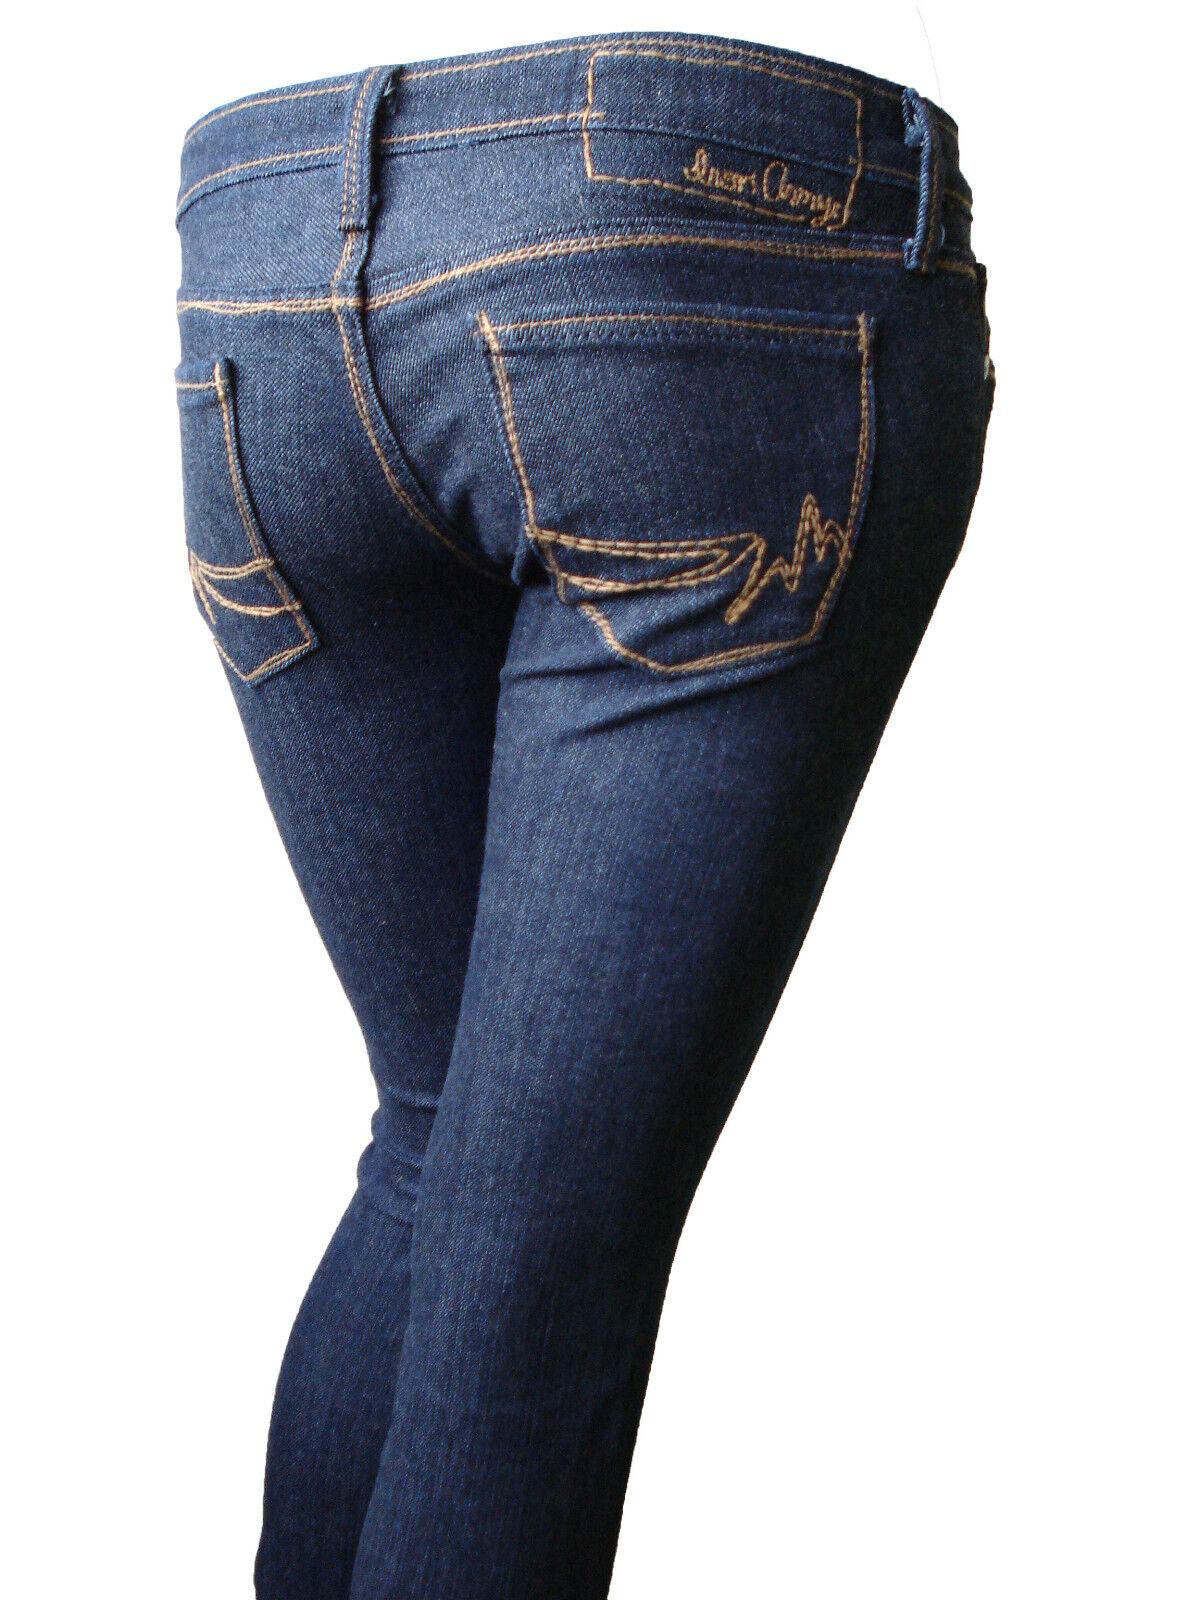 Iron Iron Iron Army Damen Denim jeans Hose Slim Skinny Röhrenjeans  Mayumi Ito   Lola 78a73c